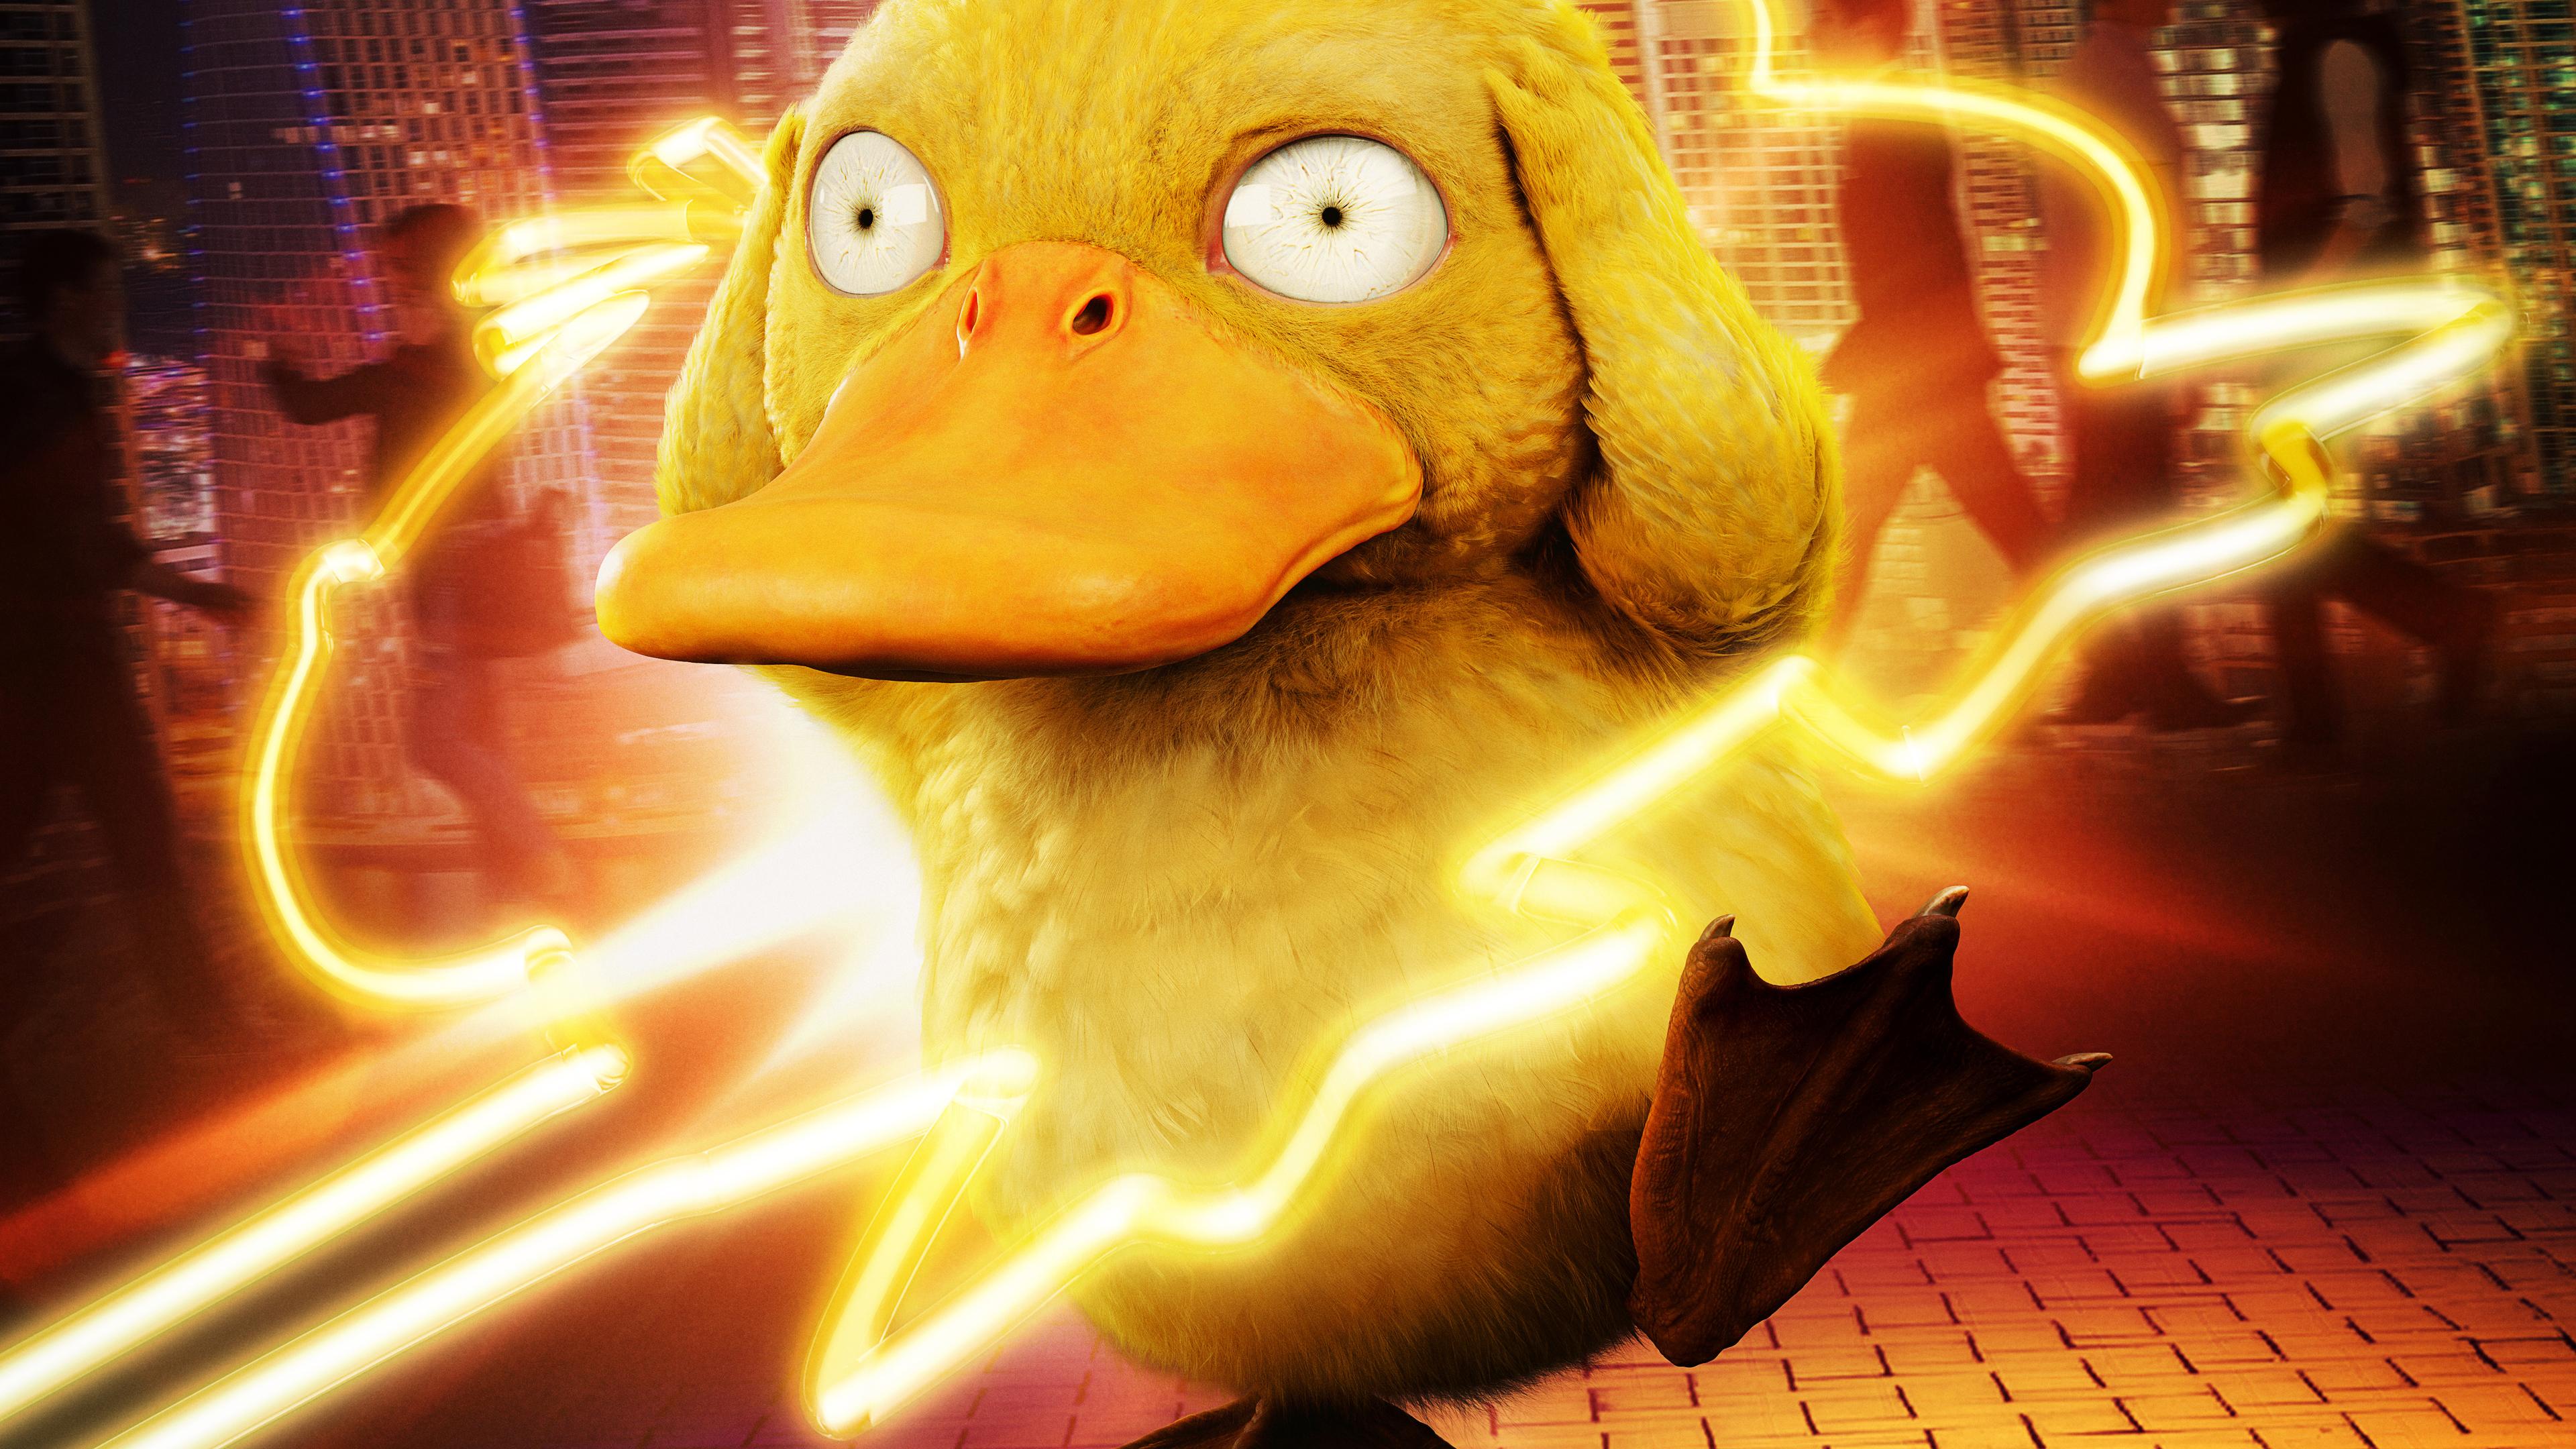 detective pikachu koda duck 4k 1558220007 - Detective Pikachu Koda Duck 4k - pokemon detective pikachu wallpapers, movies wallpapers, hd-wallpapers, detective pikachu movie wallpapers, 4k-wallpapers, 2019 movies wallpapers